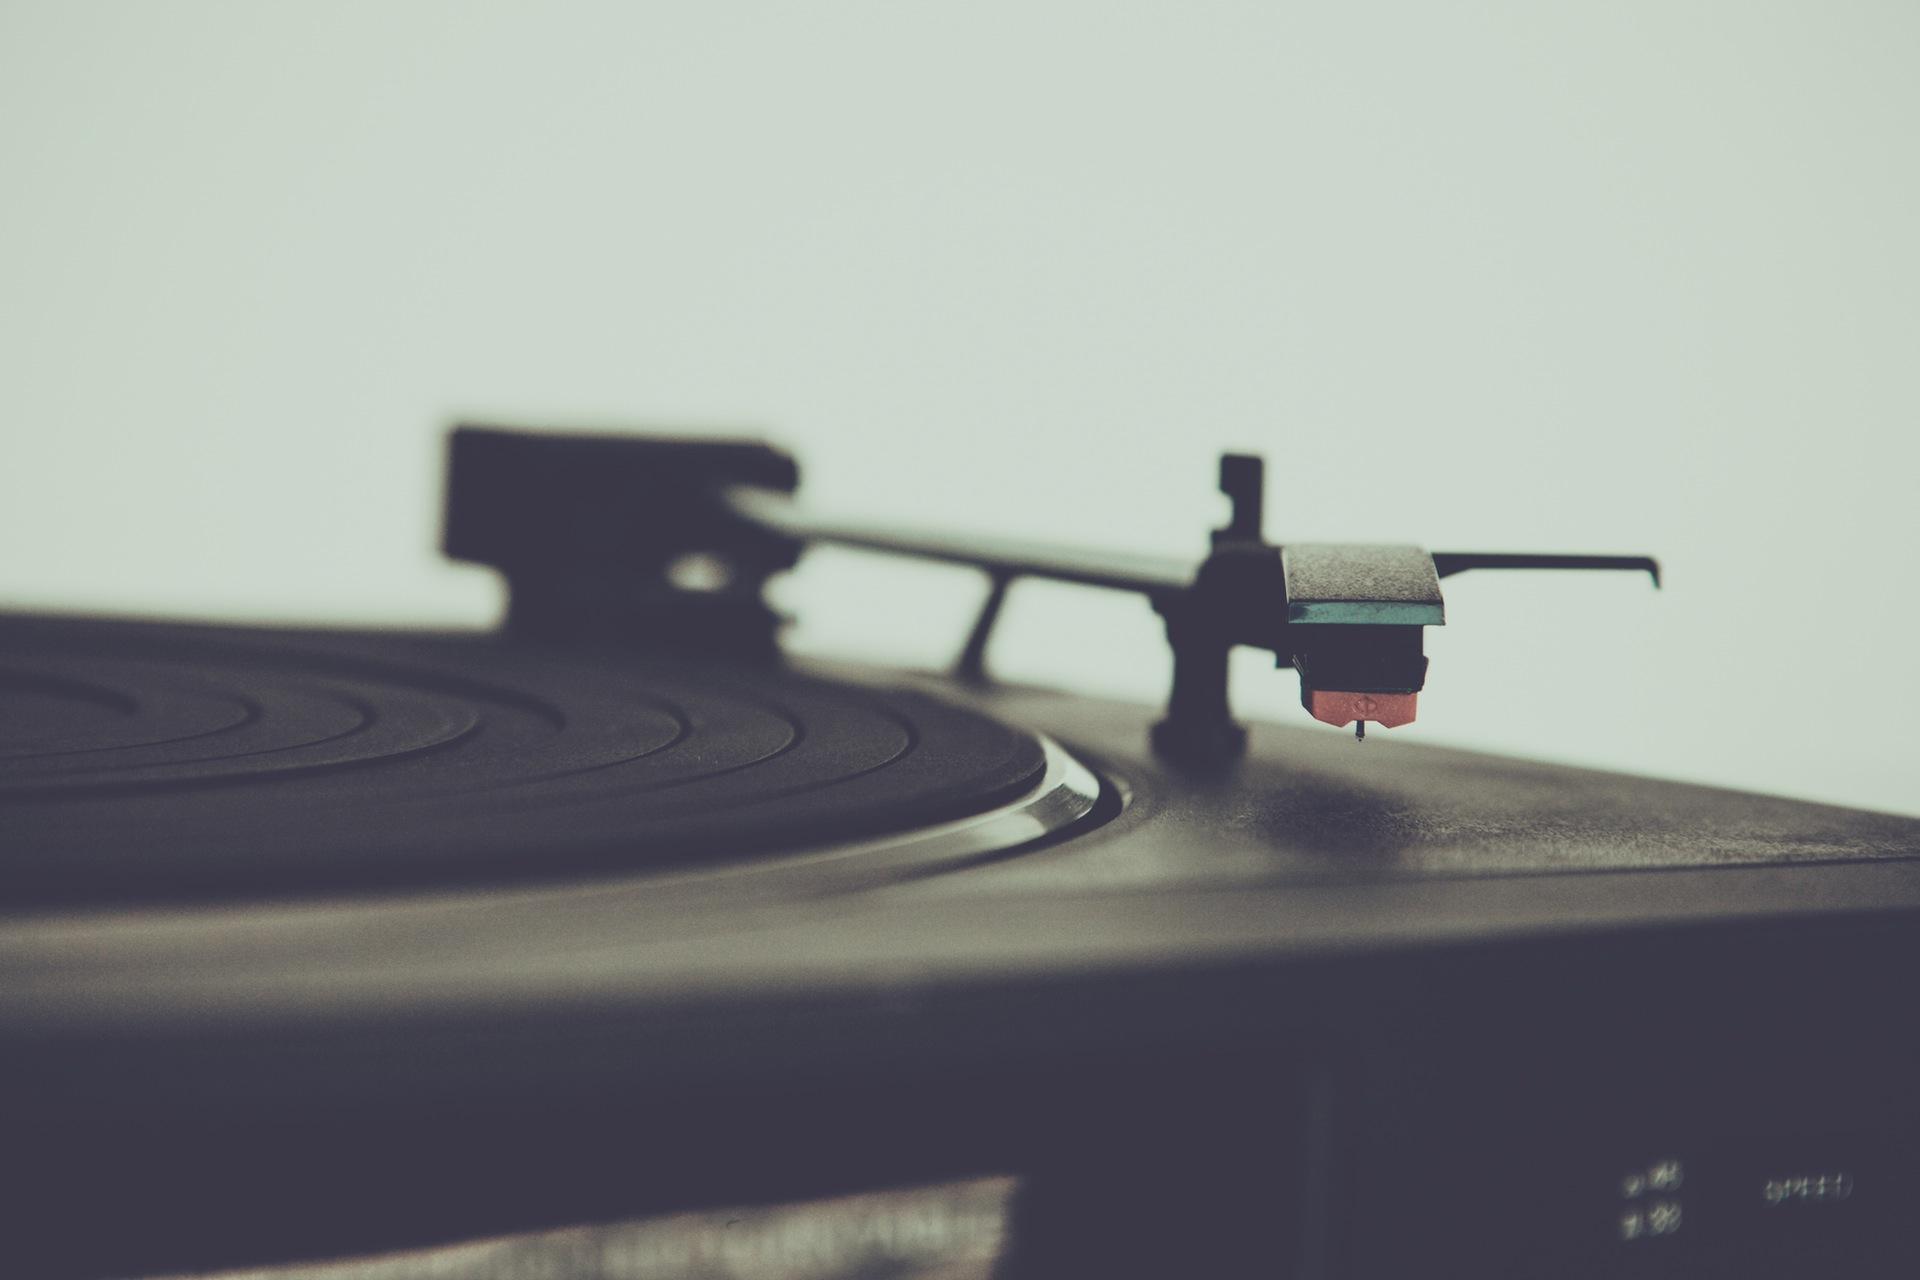 turntable के, डिस्क, Vinyl, विंटेज, रेट्रो - HD वॉलपेपर - प्रोफेसर-falken.com